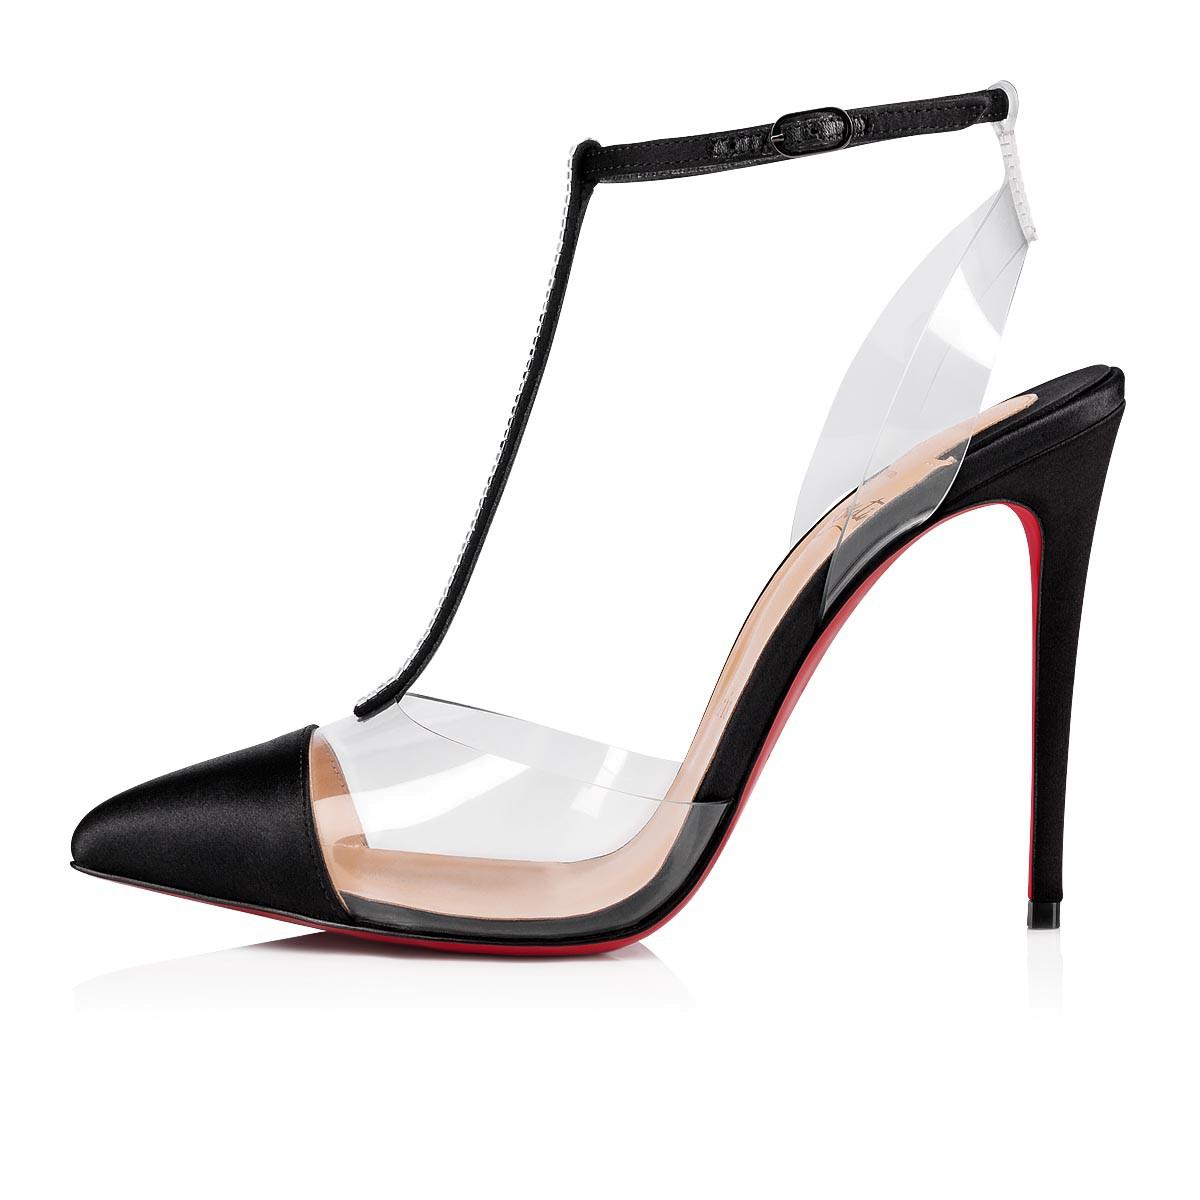 鞋履 - Nosy Strass - Christian Louboutin